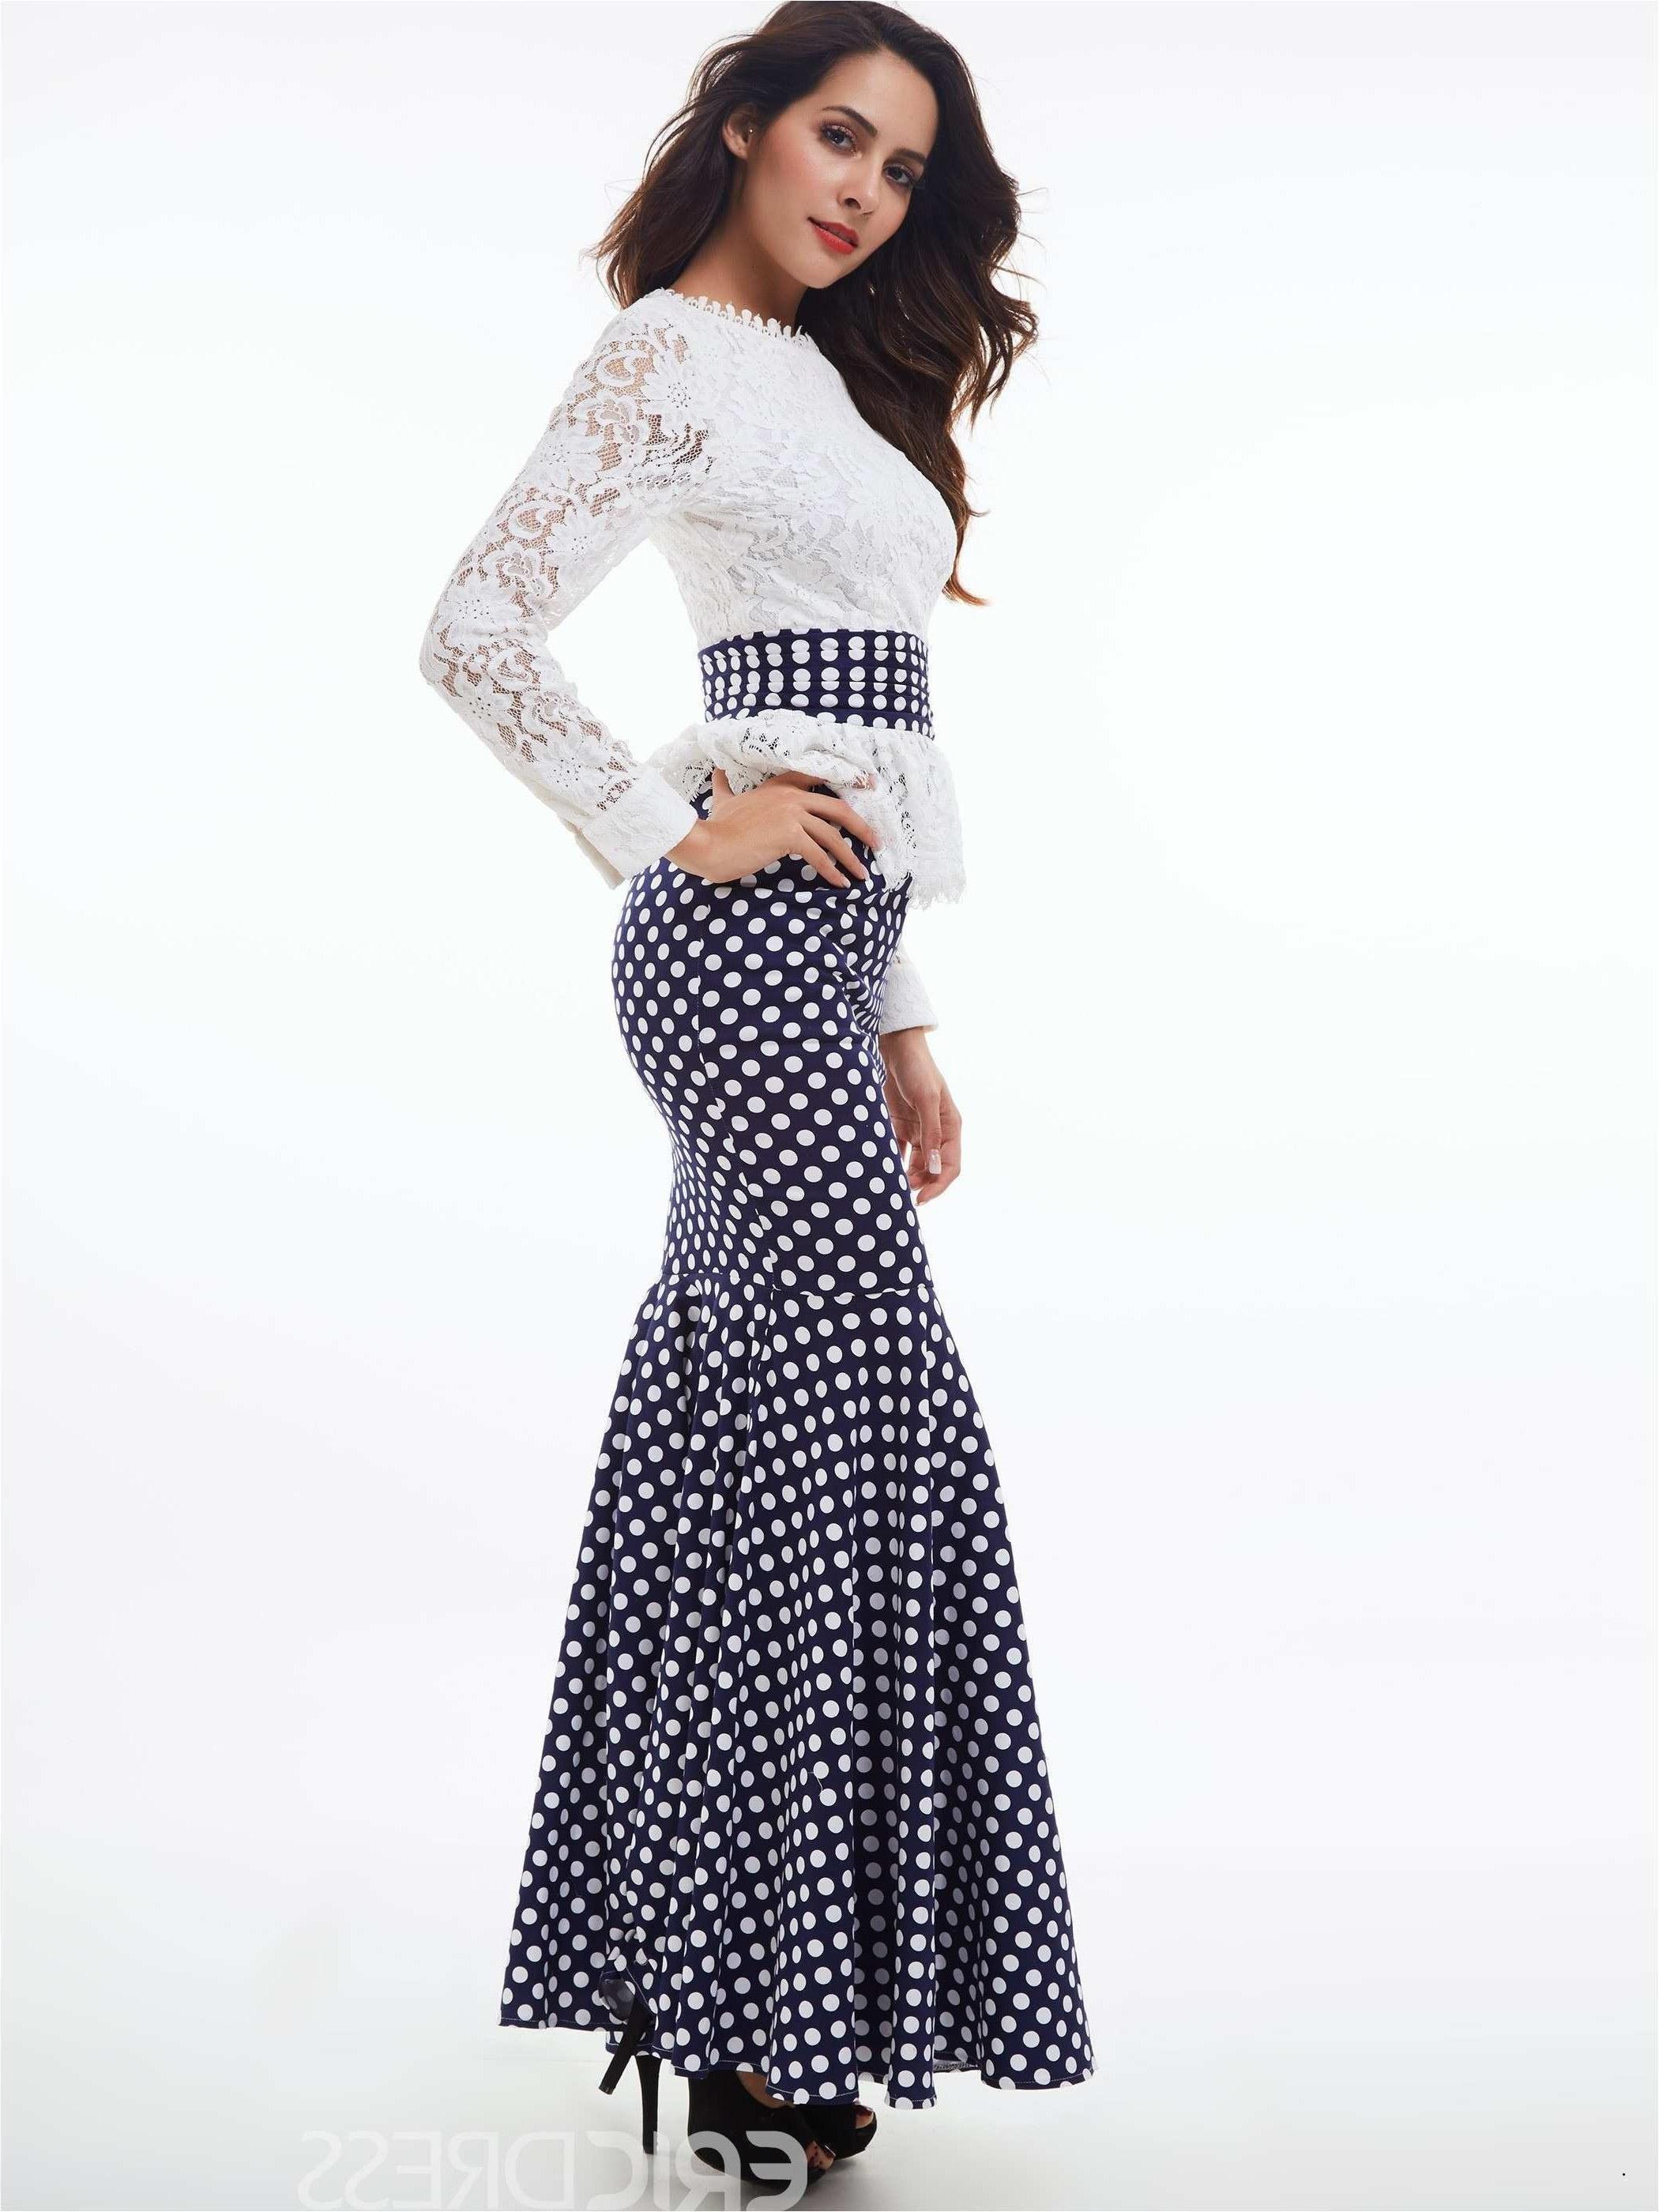 Design Fitting Baju Pengantin Muslimah Zwd9 Ecehispanic